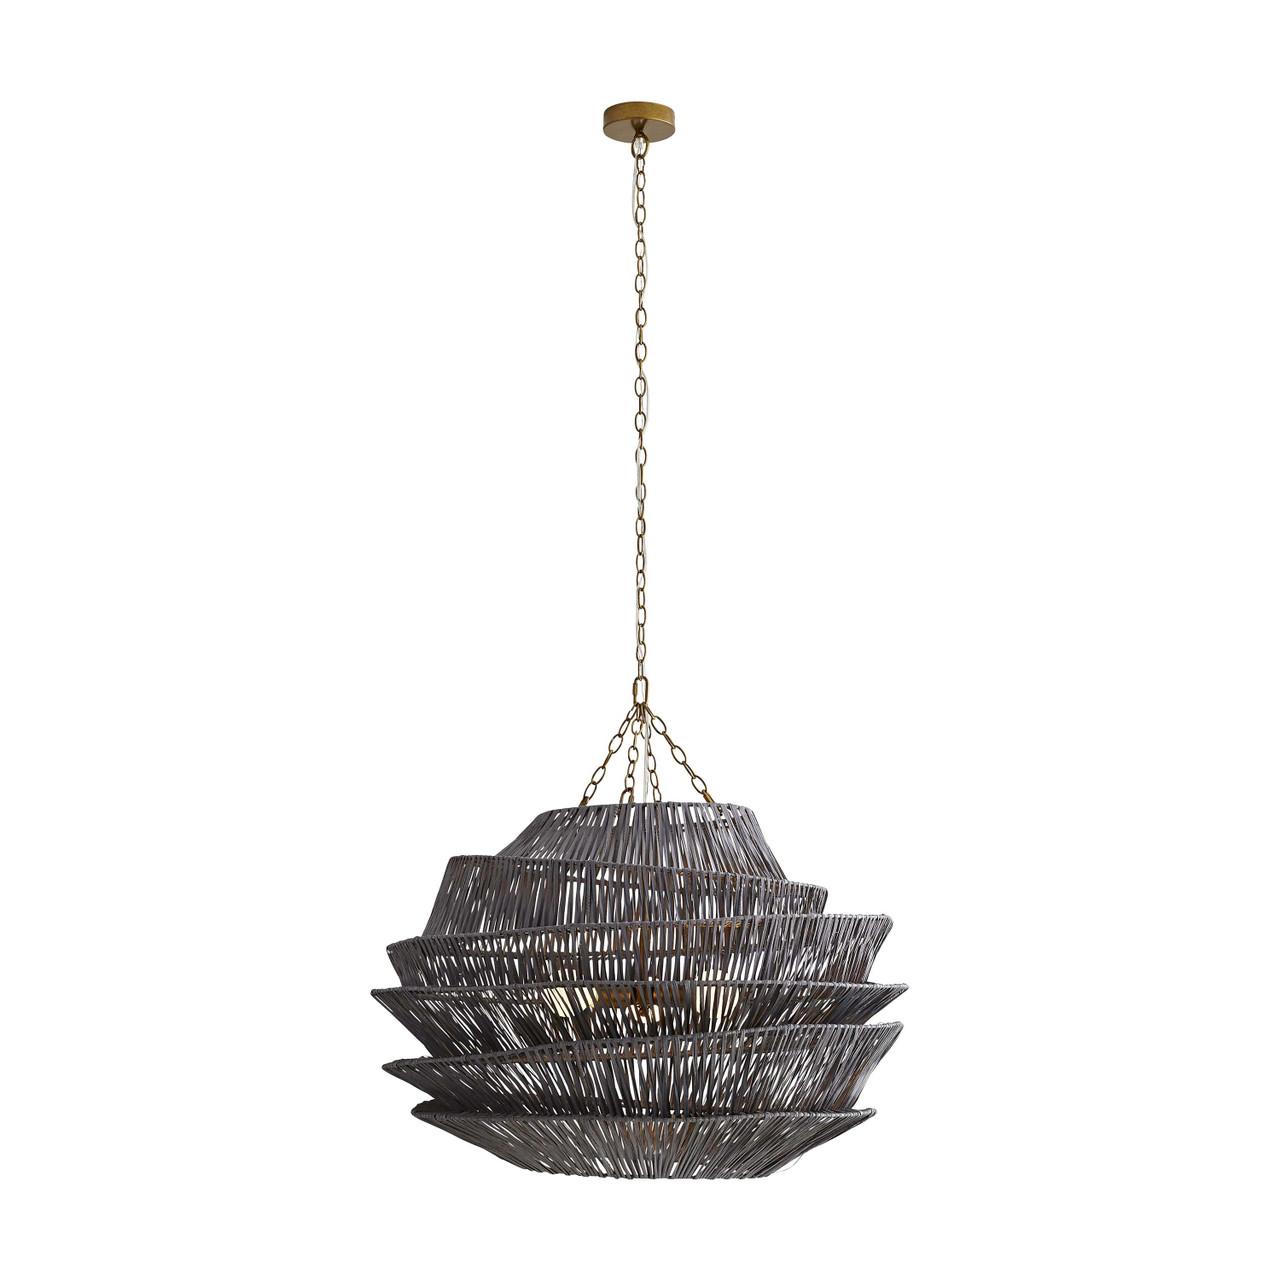 Arton Pendant Dark Gray Wash, Antique Brass Iron